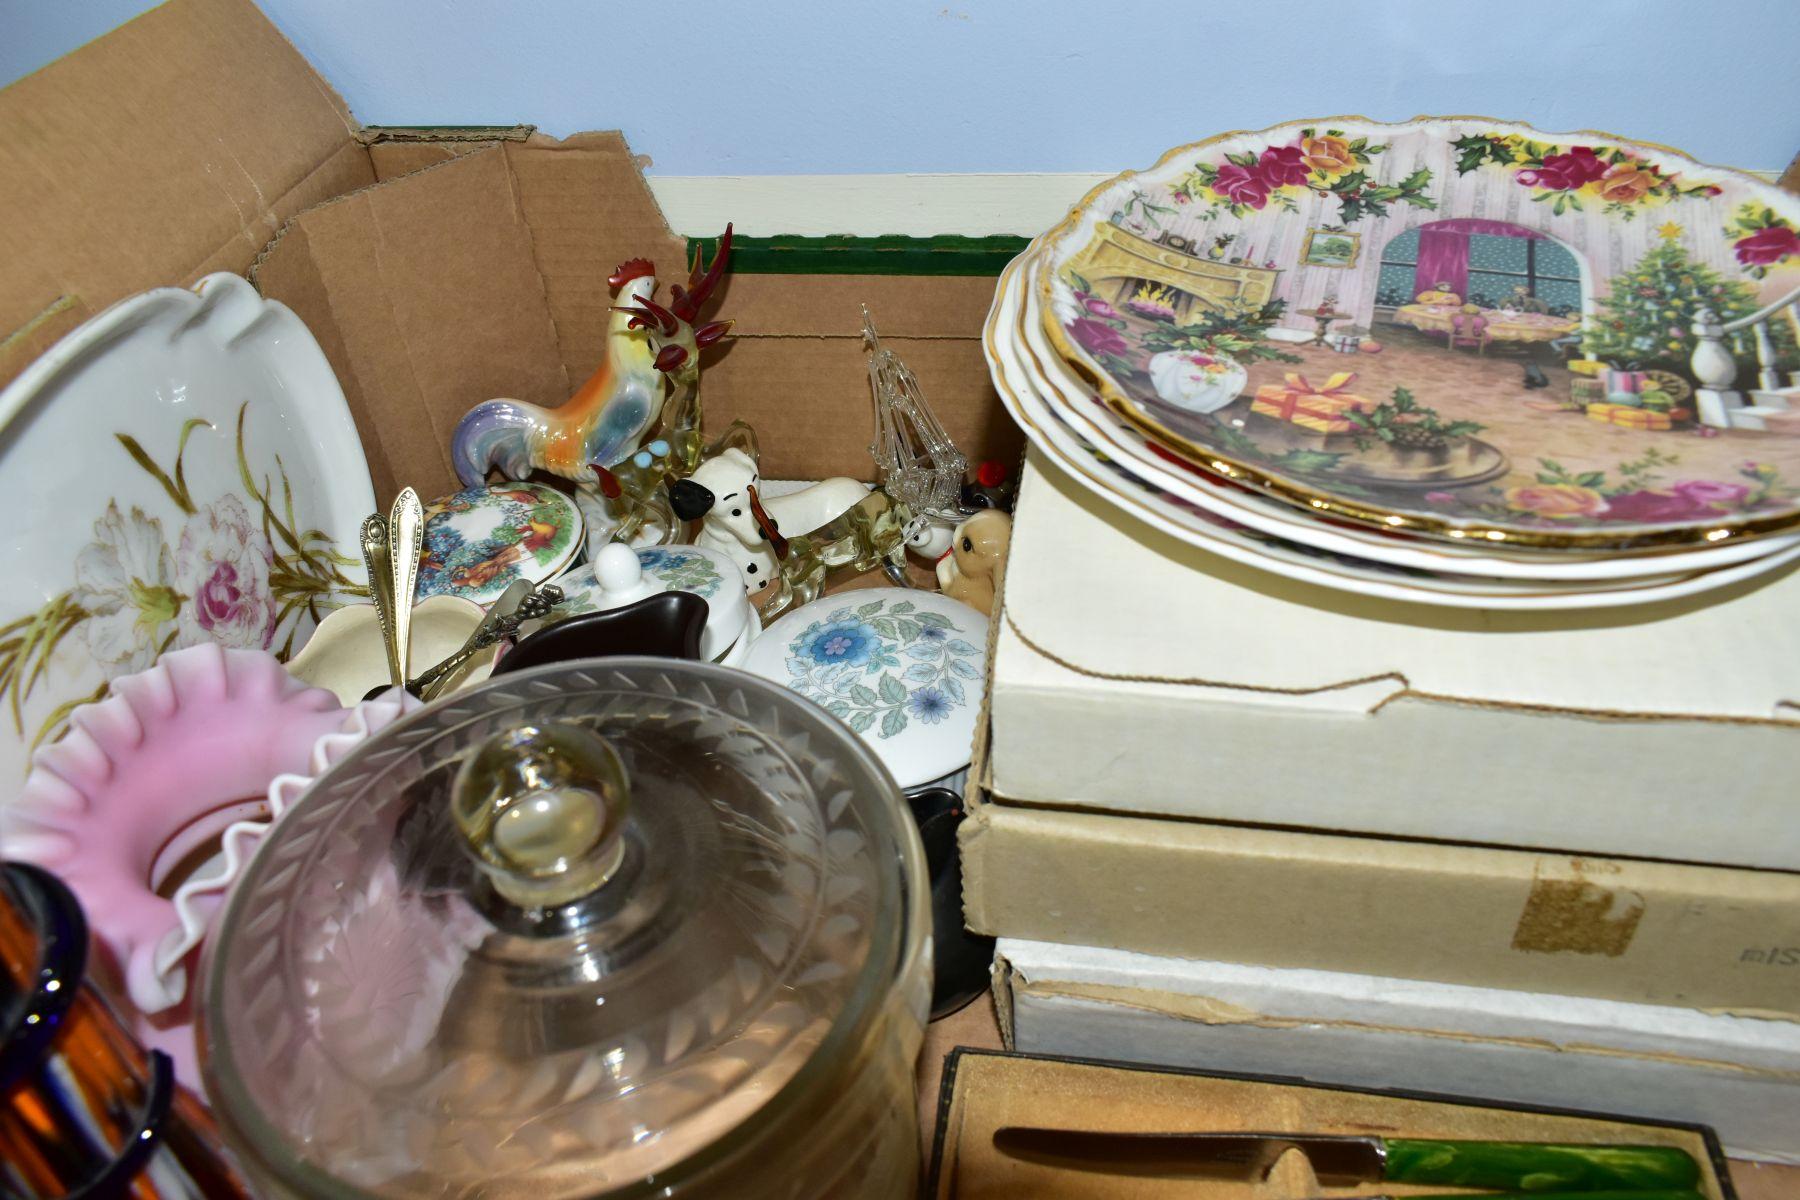 CERAMICS AND GLASS ETC, to include Melba Bone China teawares, Pallissy Casual tableware, Kalabar - Image 6 of 8